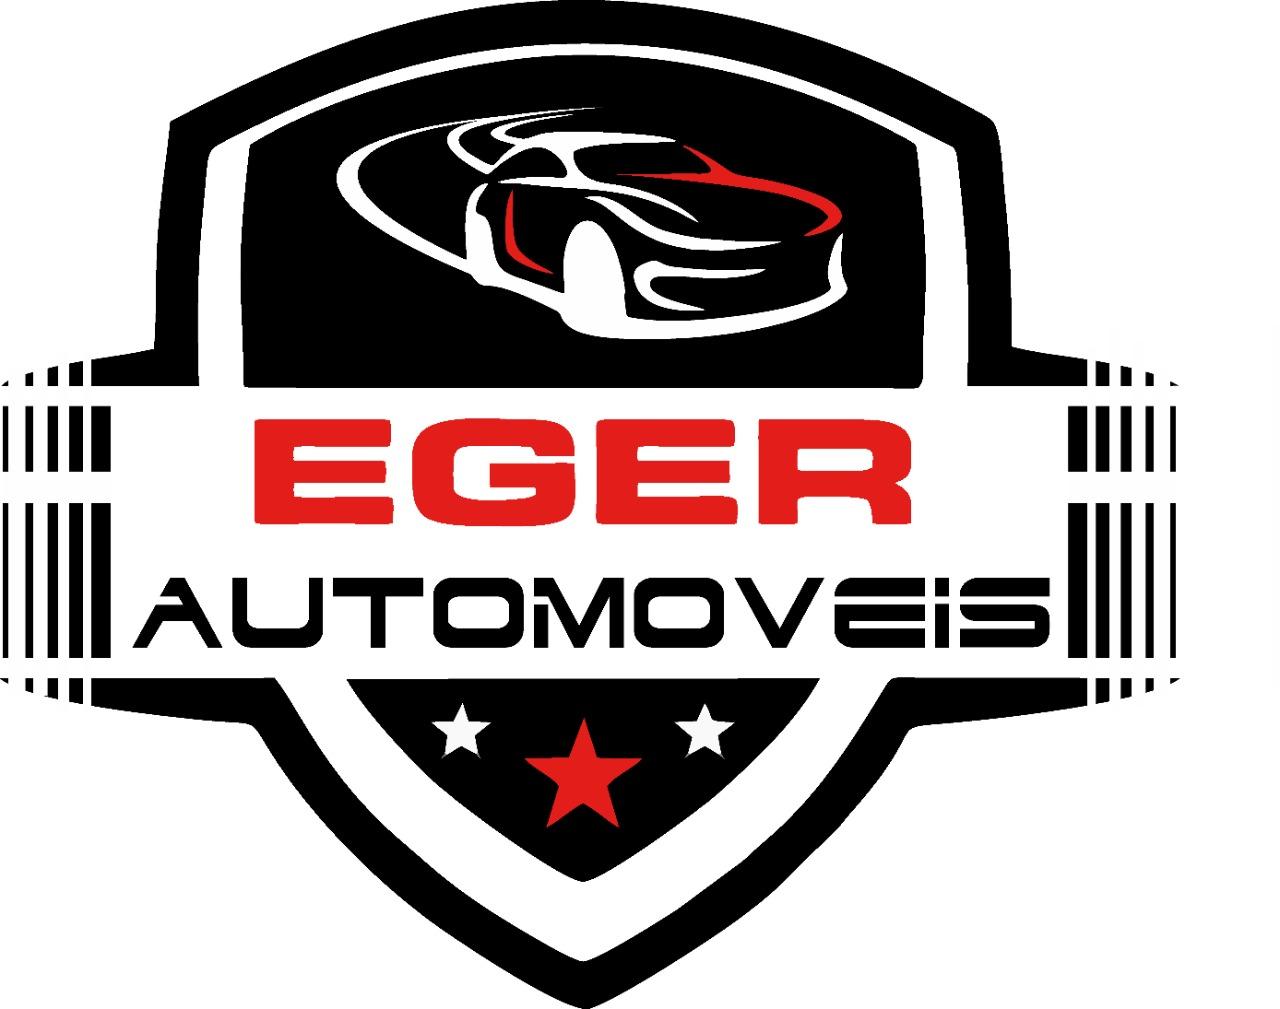 Eger Automóveis